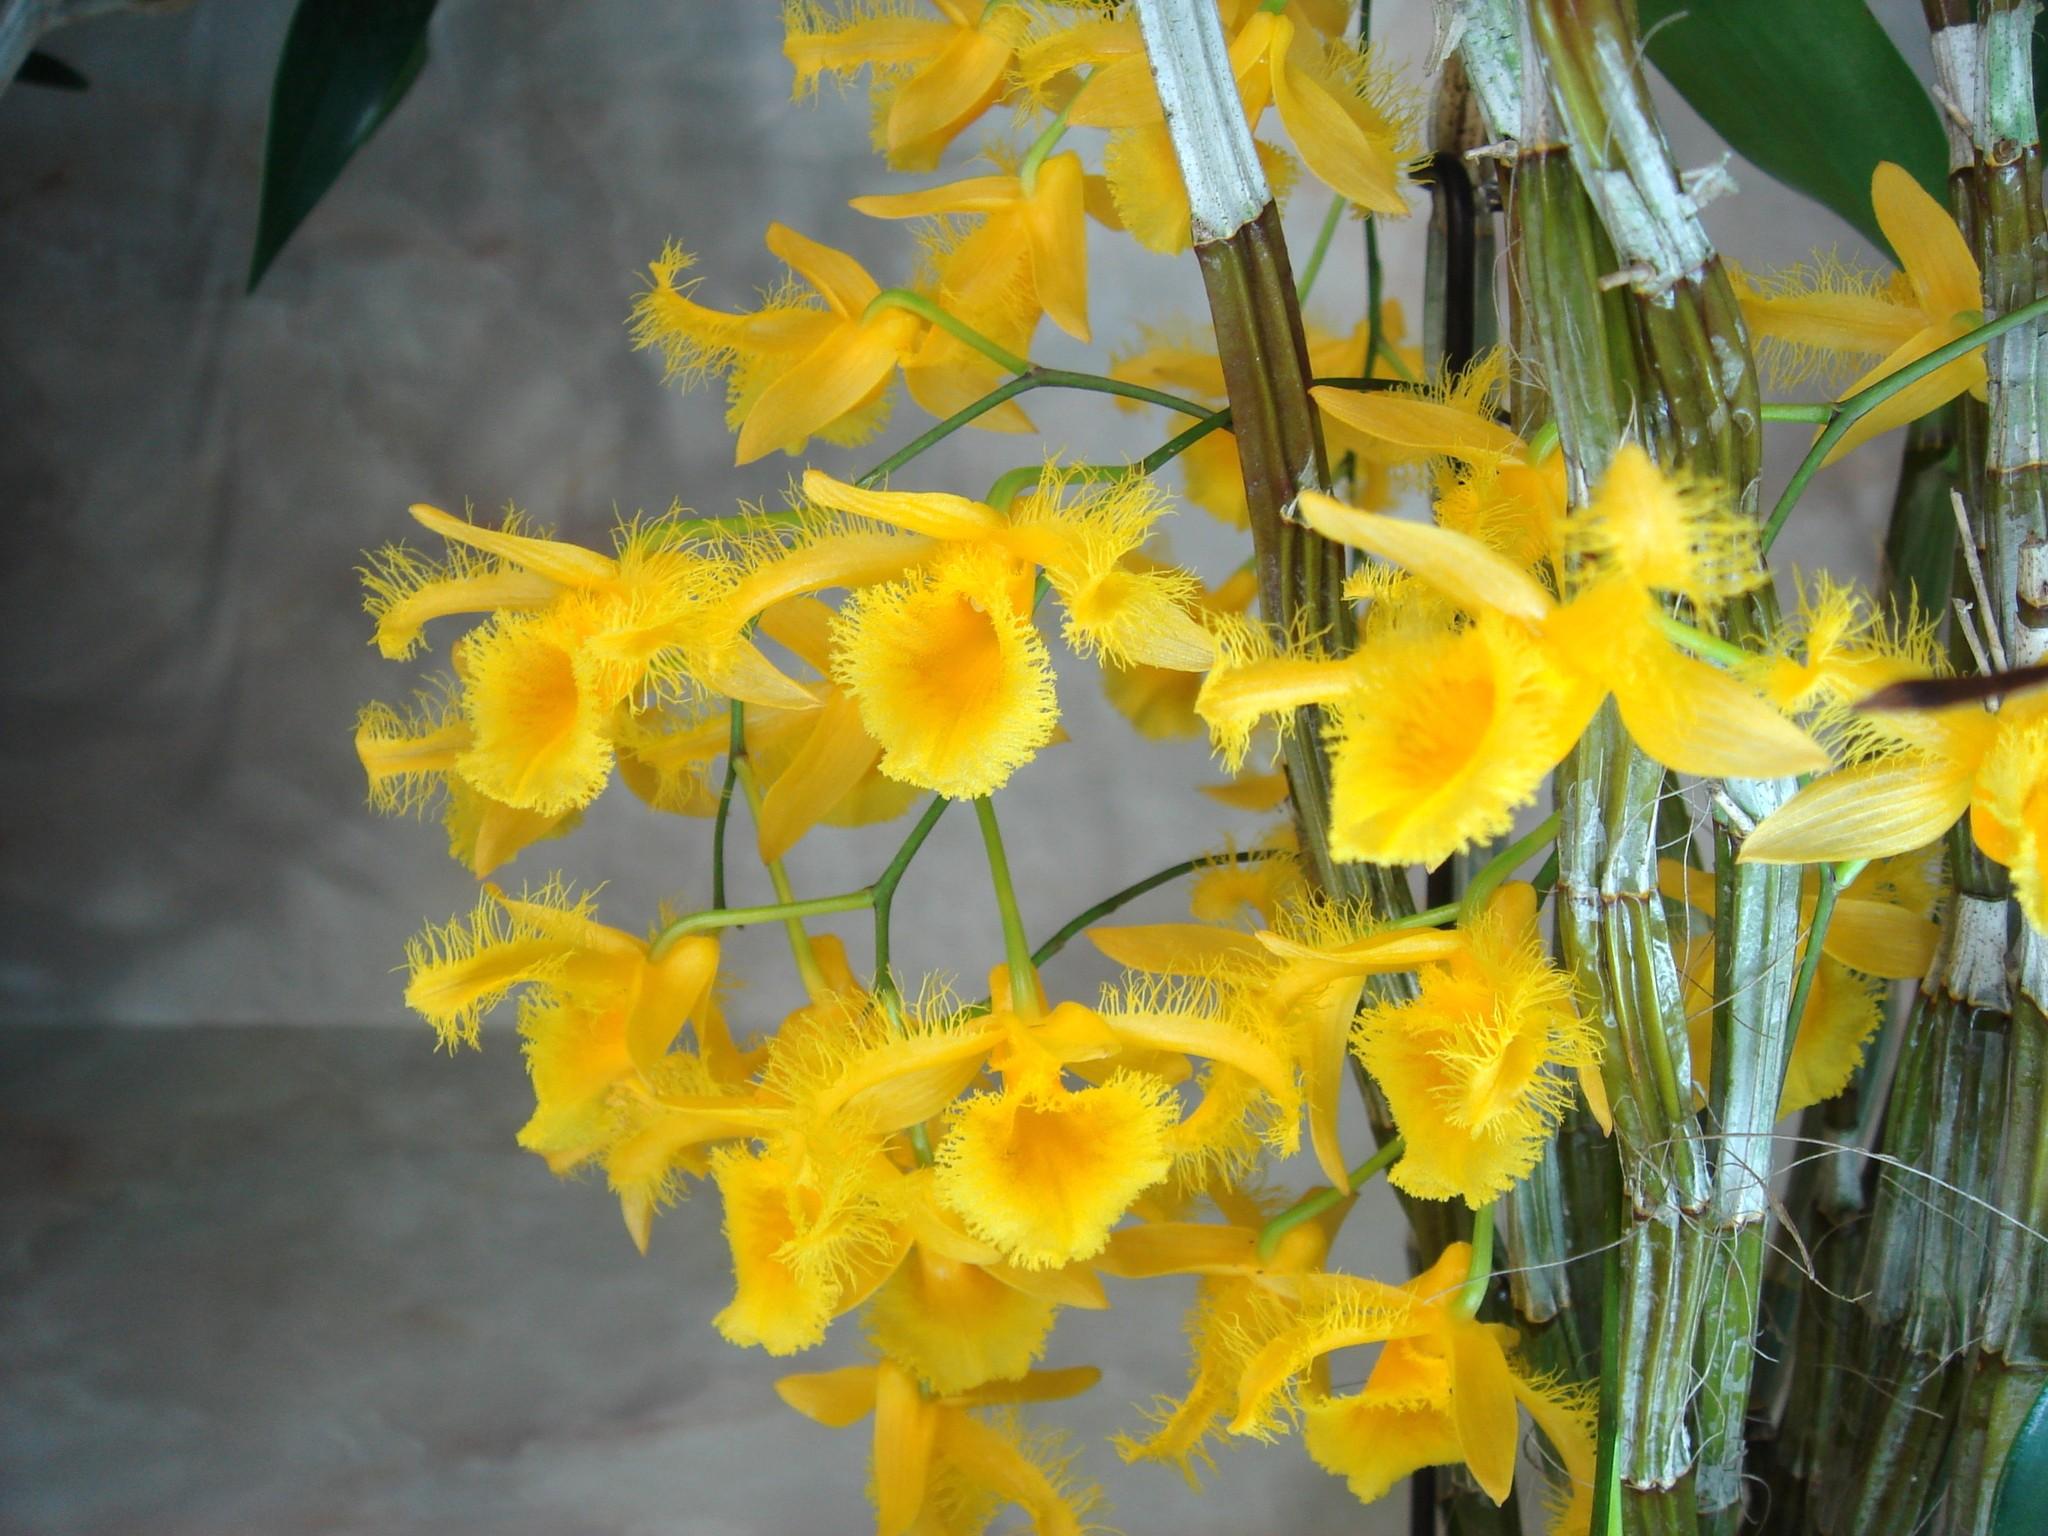 http://orchids.la.coocan.jp/Dendrobium/Dendrobium%20harveyanum/DSC01691.JPG